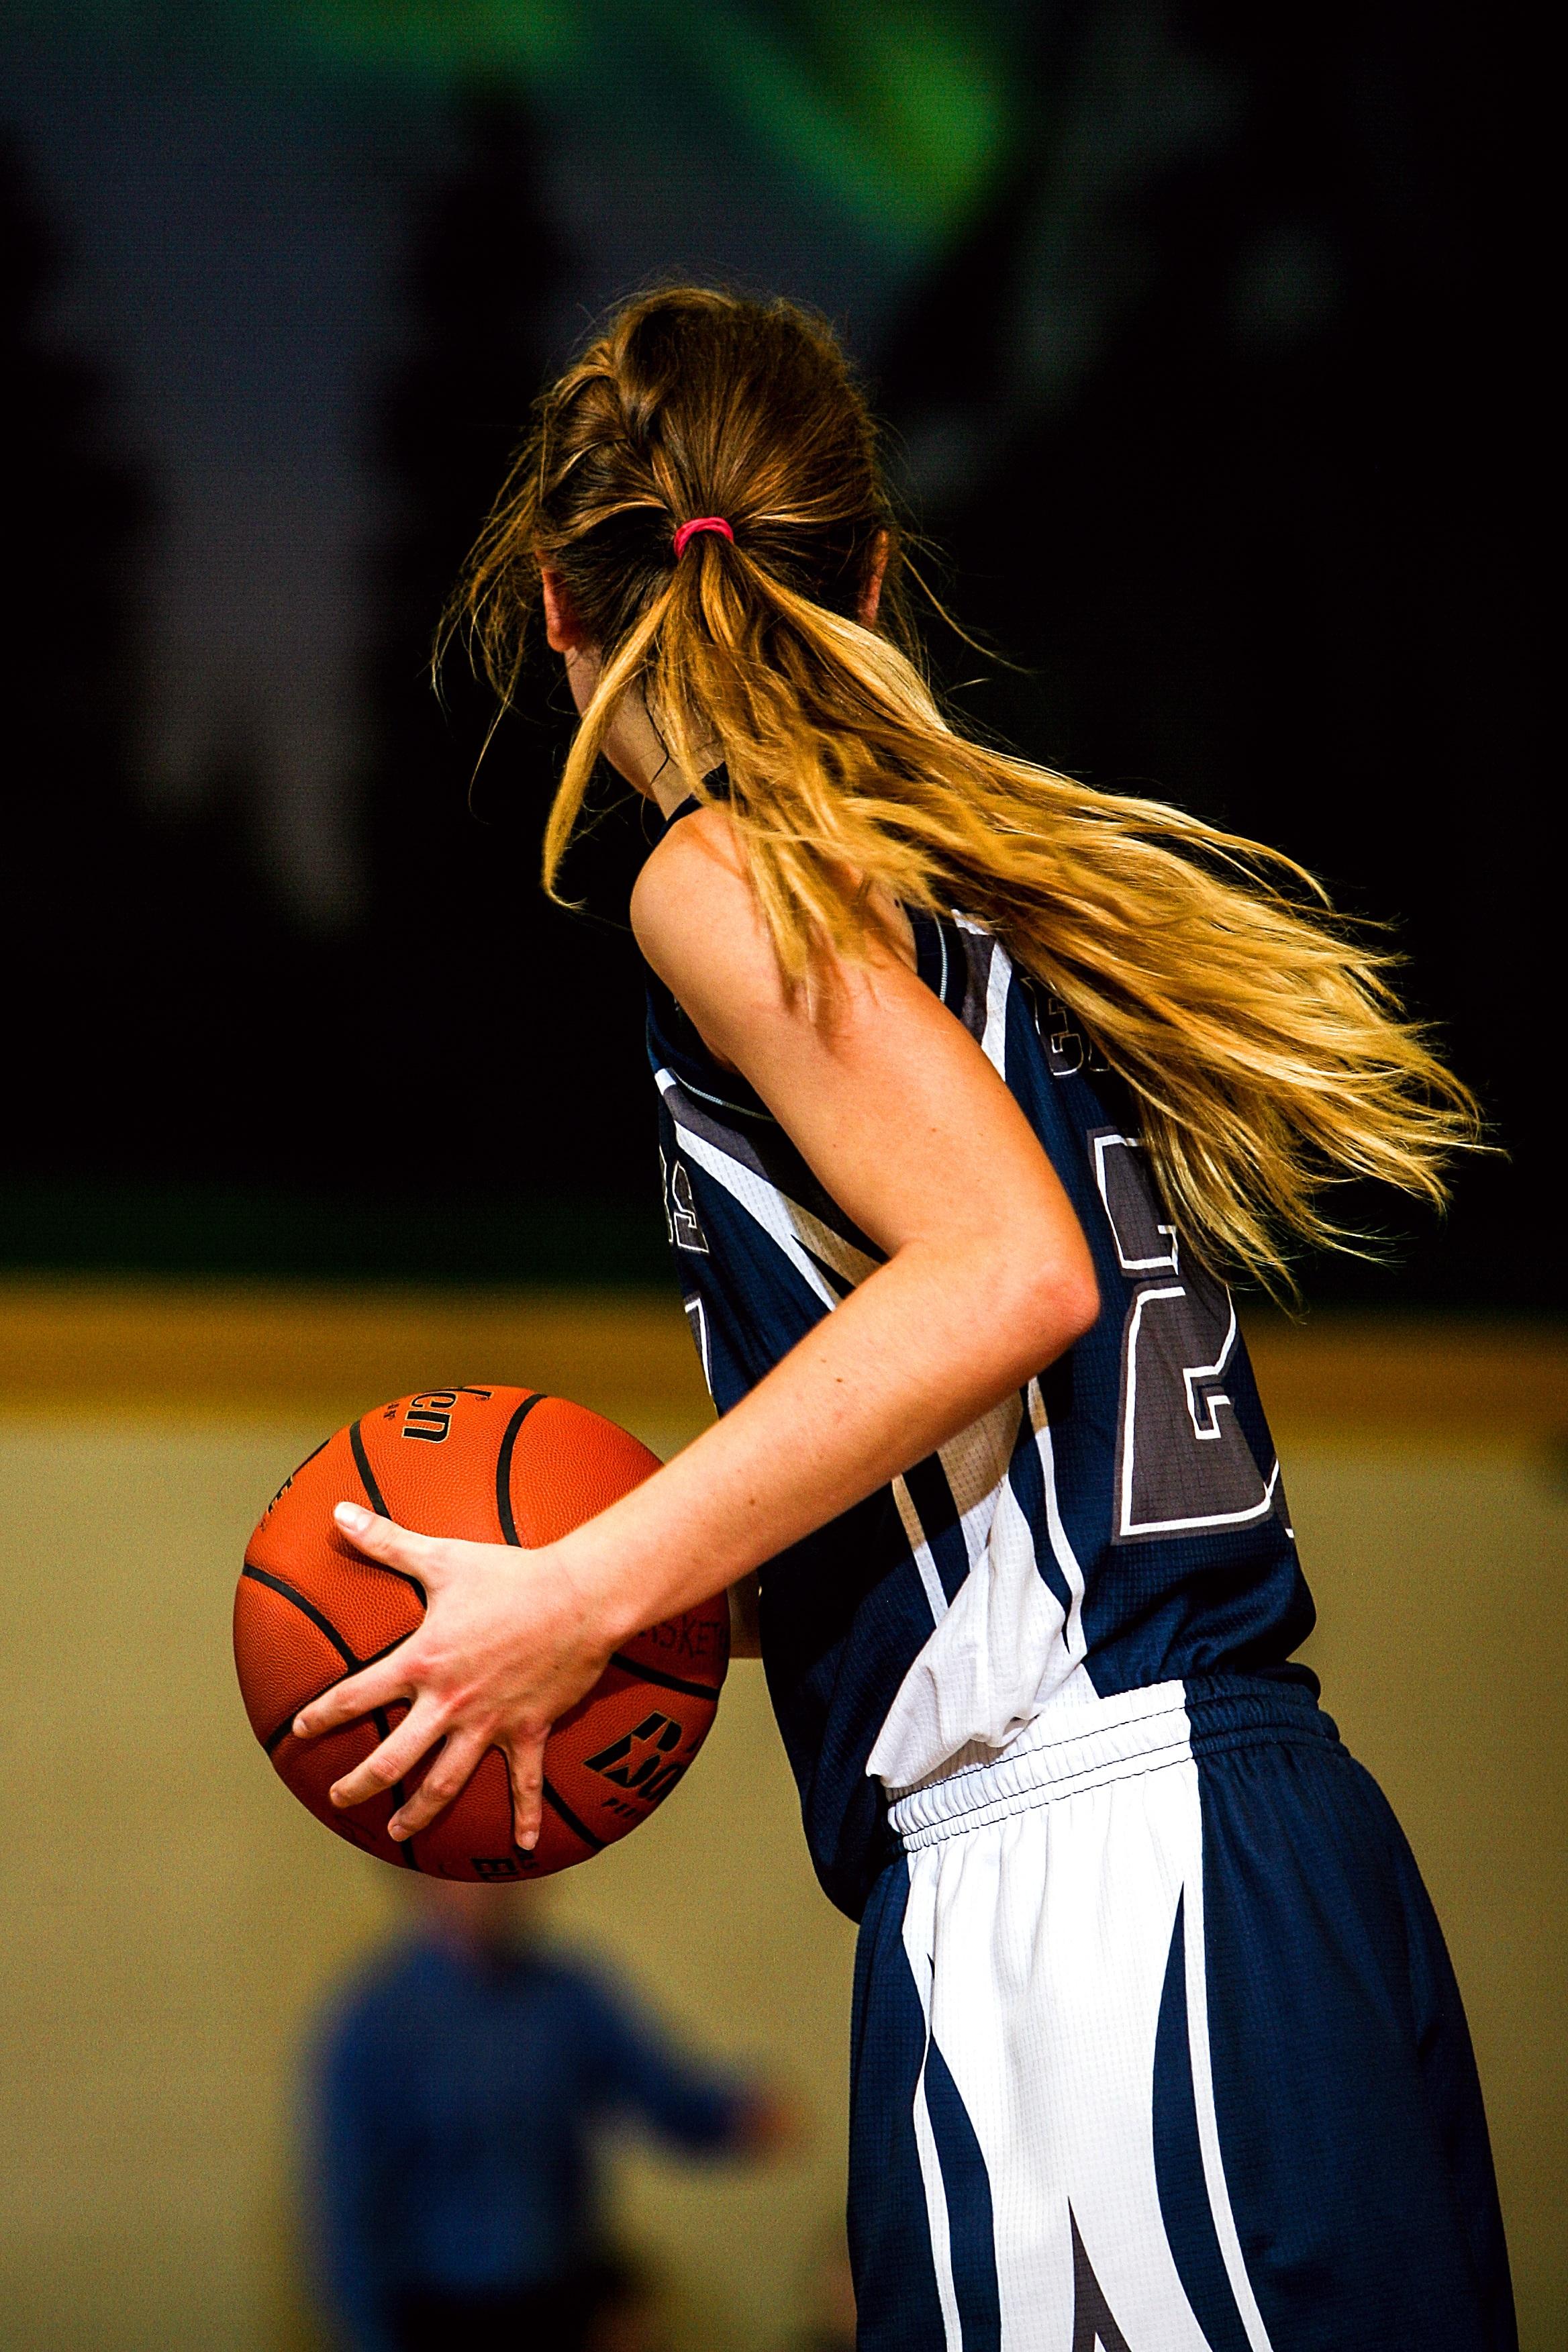 omens basketball girl - HD2336×3504